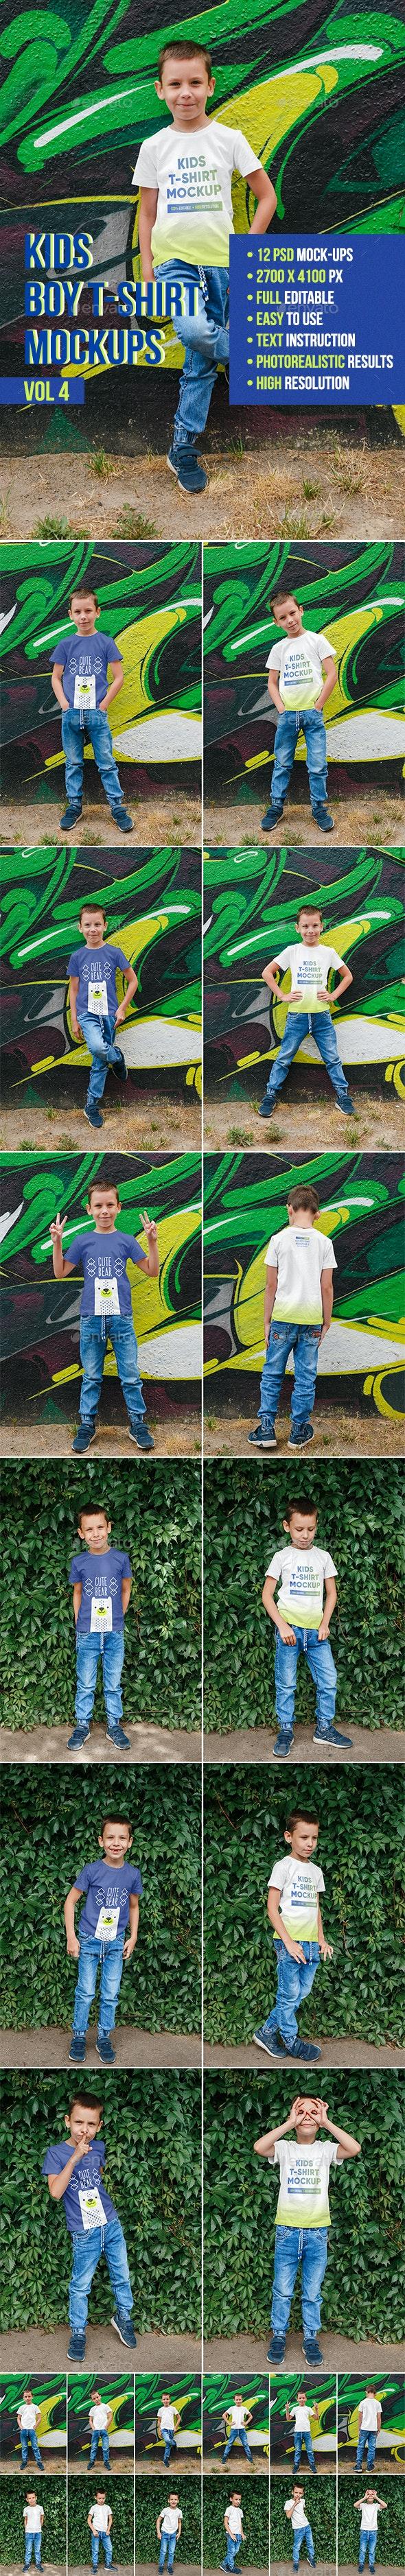 Kids Boy T-Shirt Mockups Vol4 - T-shirts Apparel